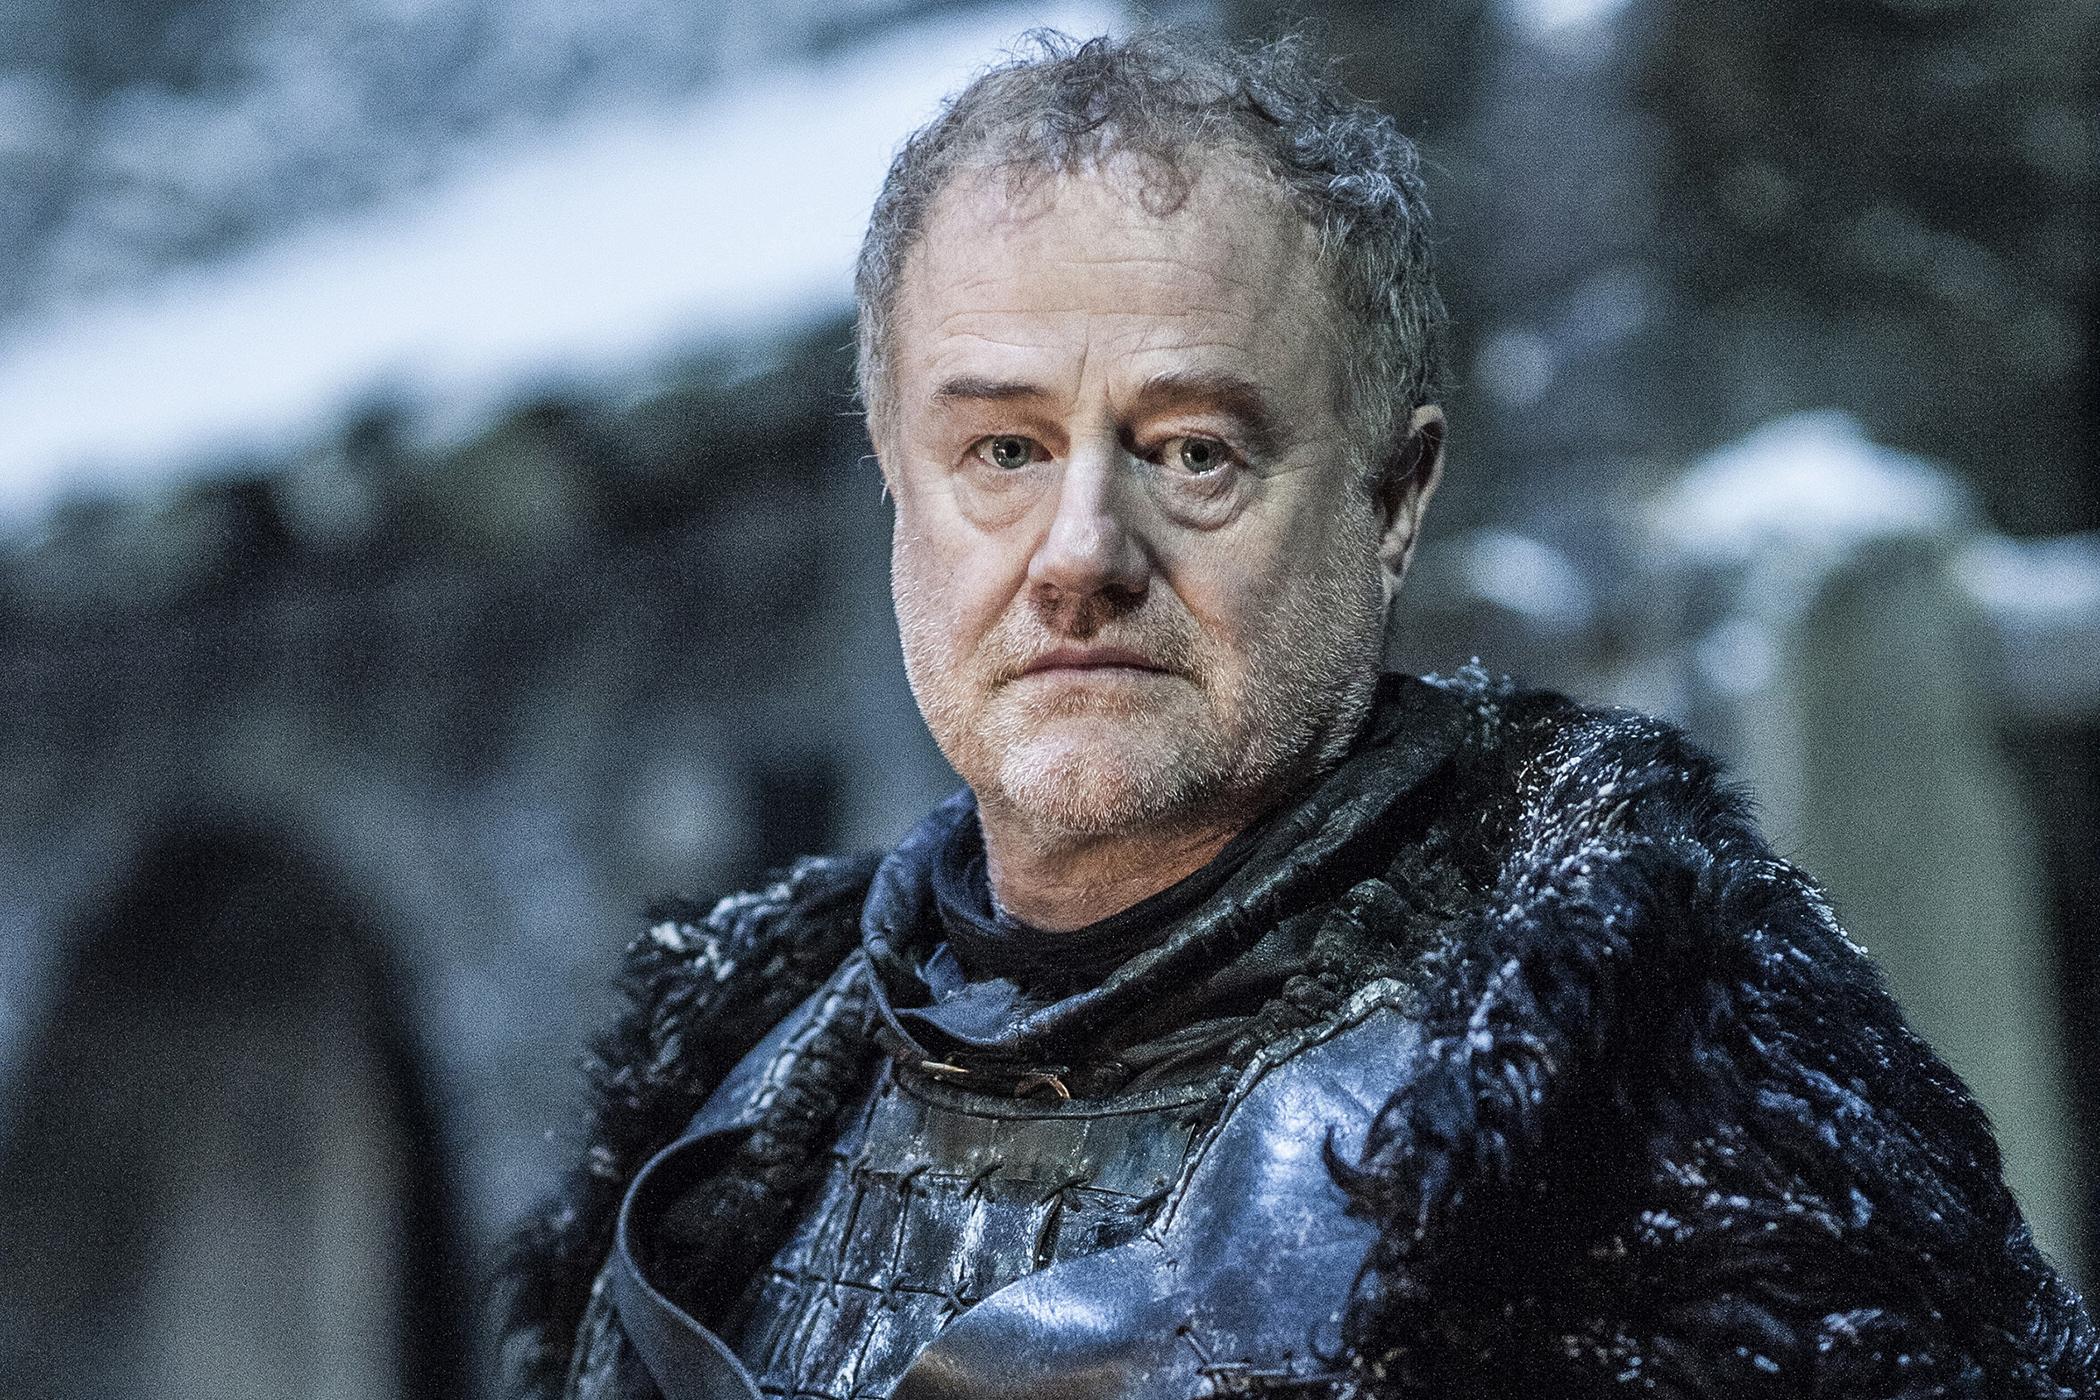 Owen Teale in season 6, episode 2 of Game of Thrones.